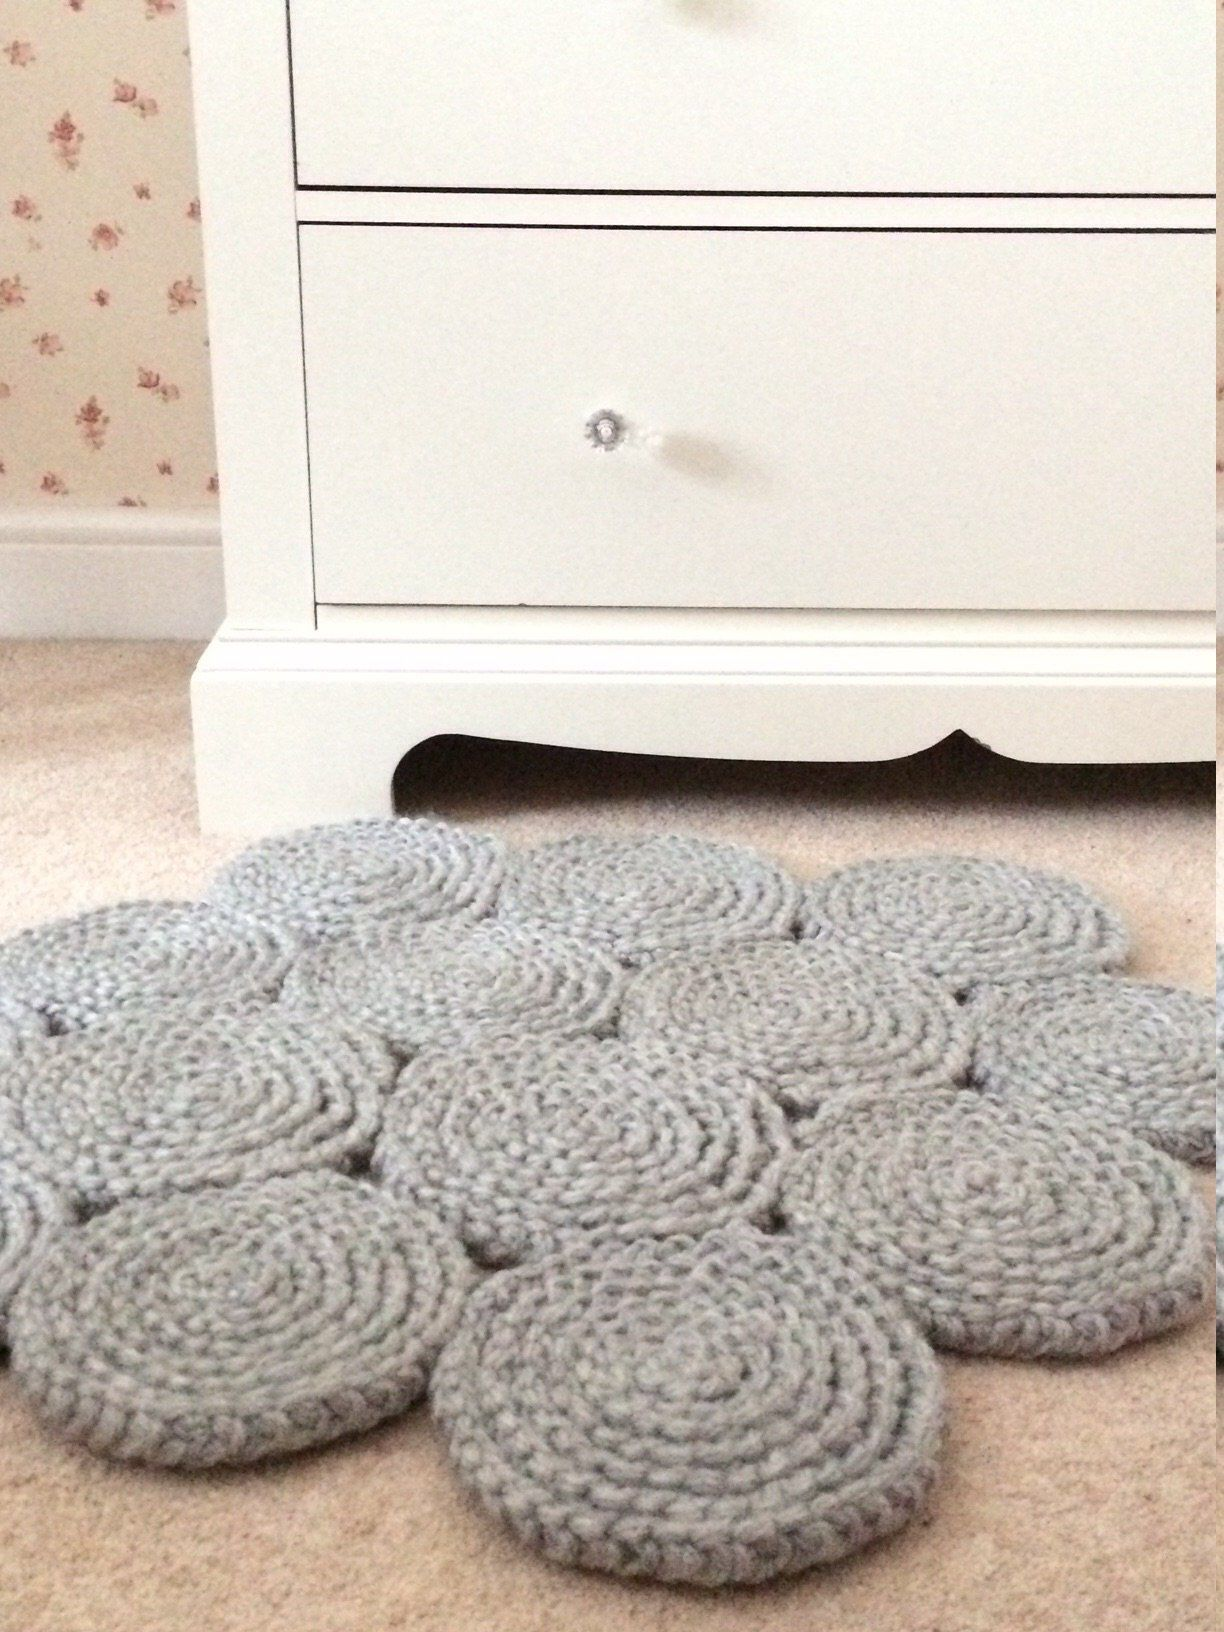 Grey Bedroom Rug Modern Nursery Rug Ready To Ship Grey Bedroom Rug Baby Room Rugs Grey Nursery Decor